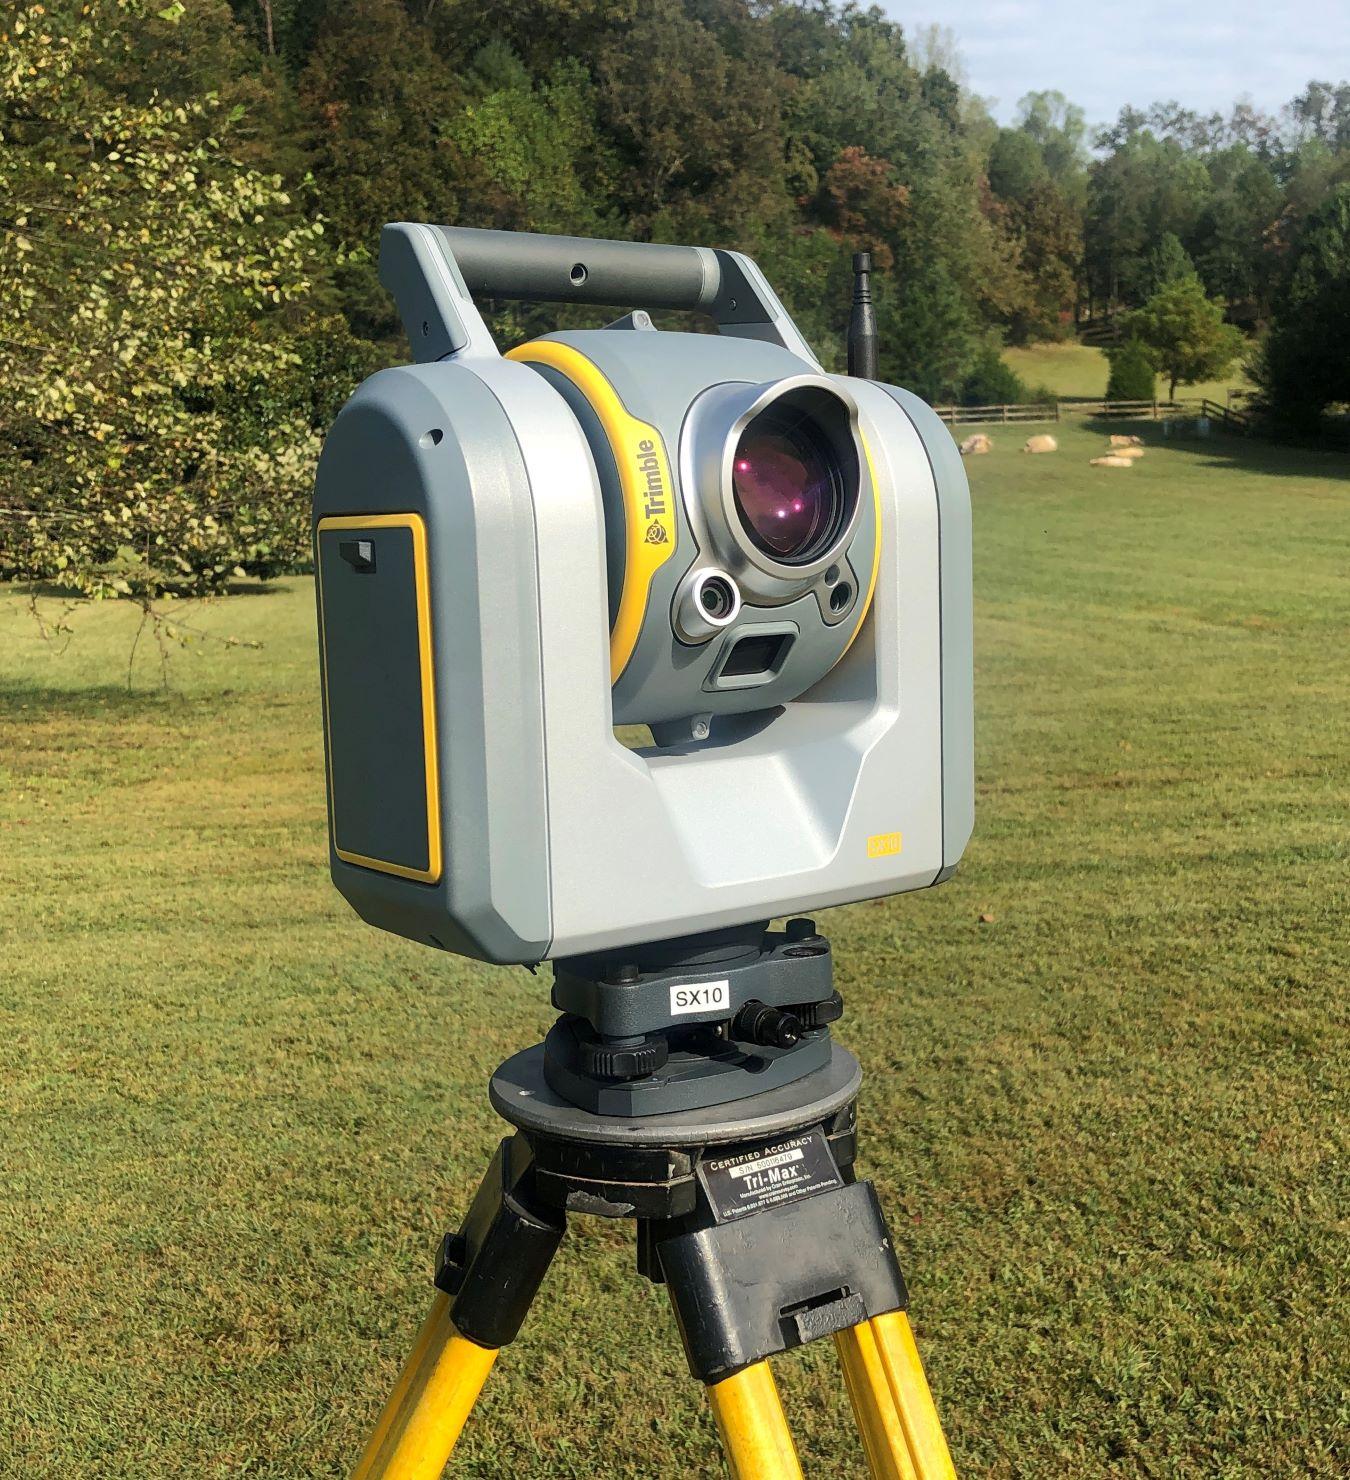 Trimble SX10 Laser Scanning Total Station